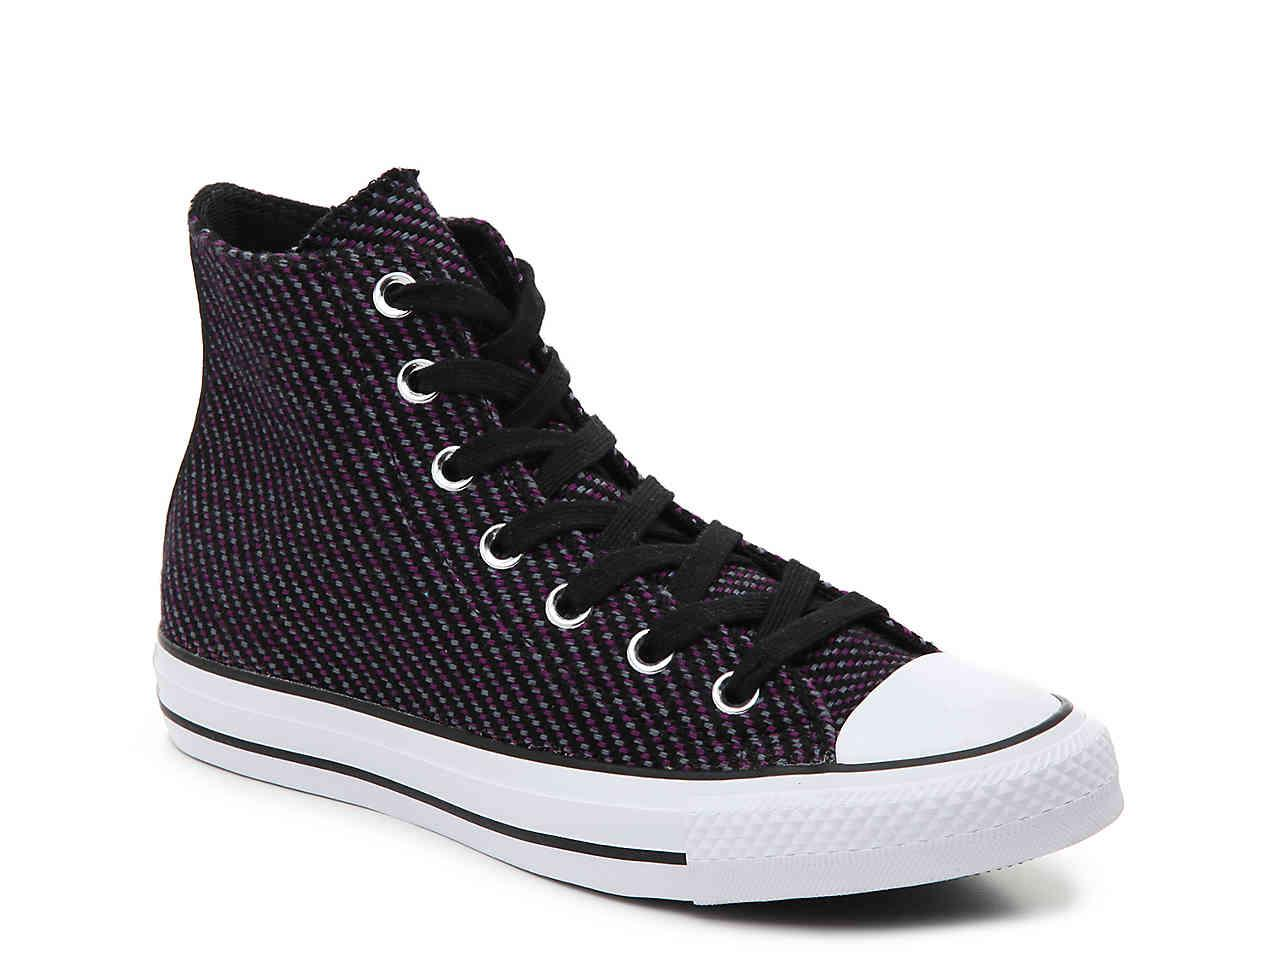 95bba44ef60f3b Lyst - Converse Chuck Taylor All Star Knit High-top Sneaker in Black